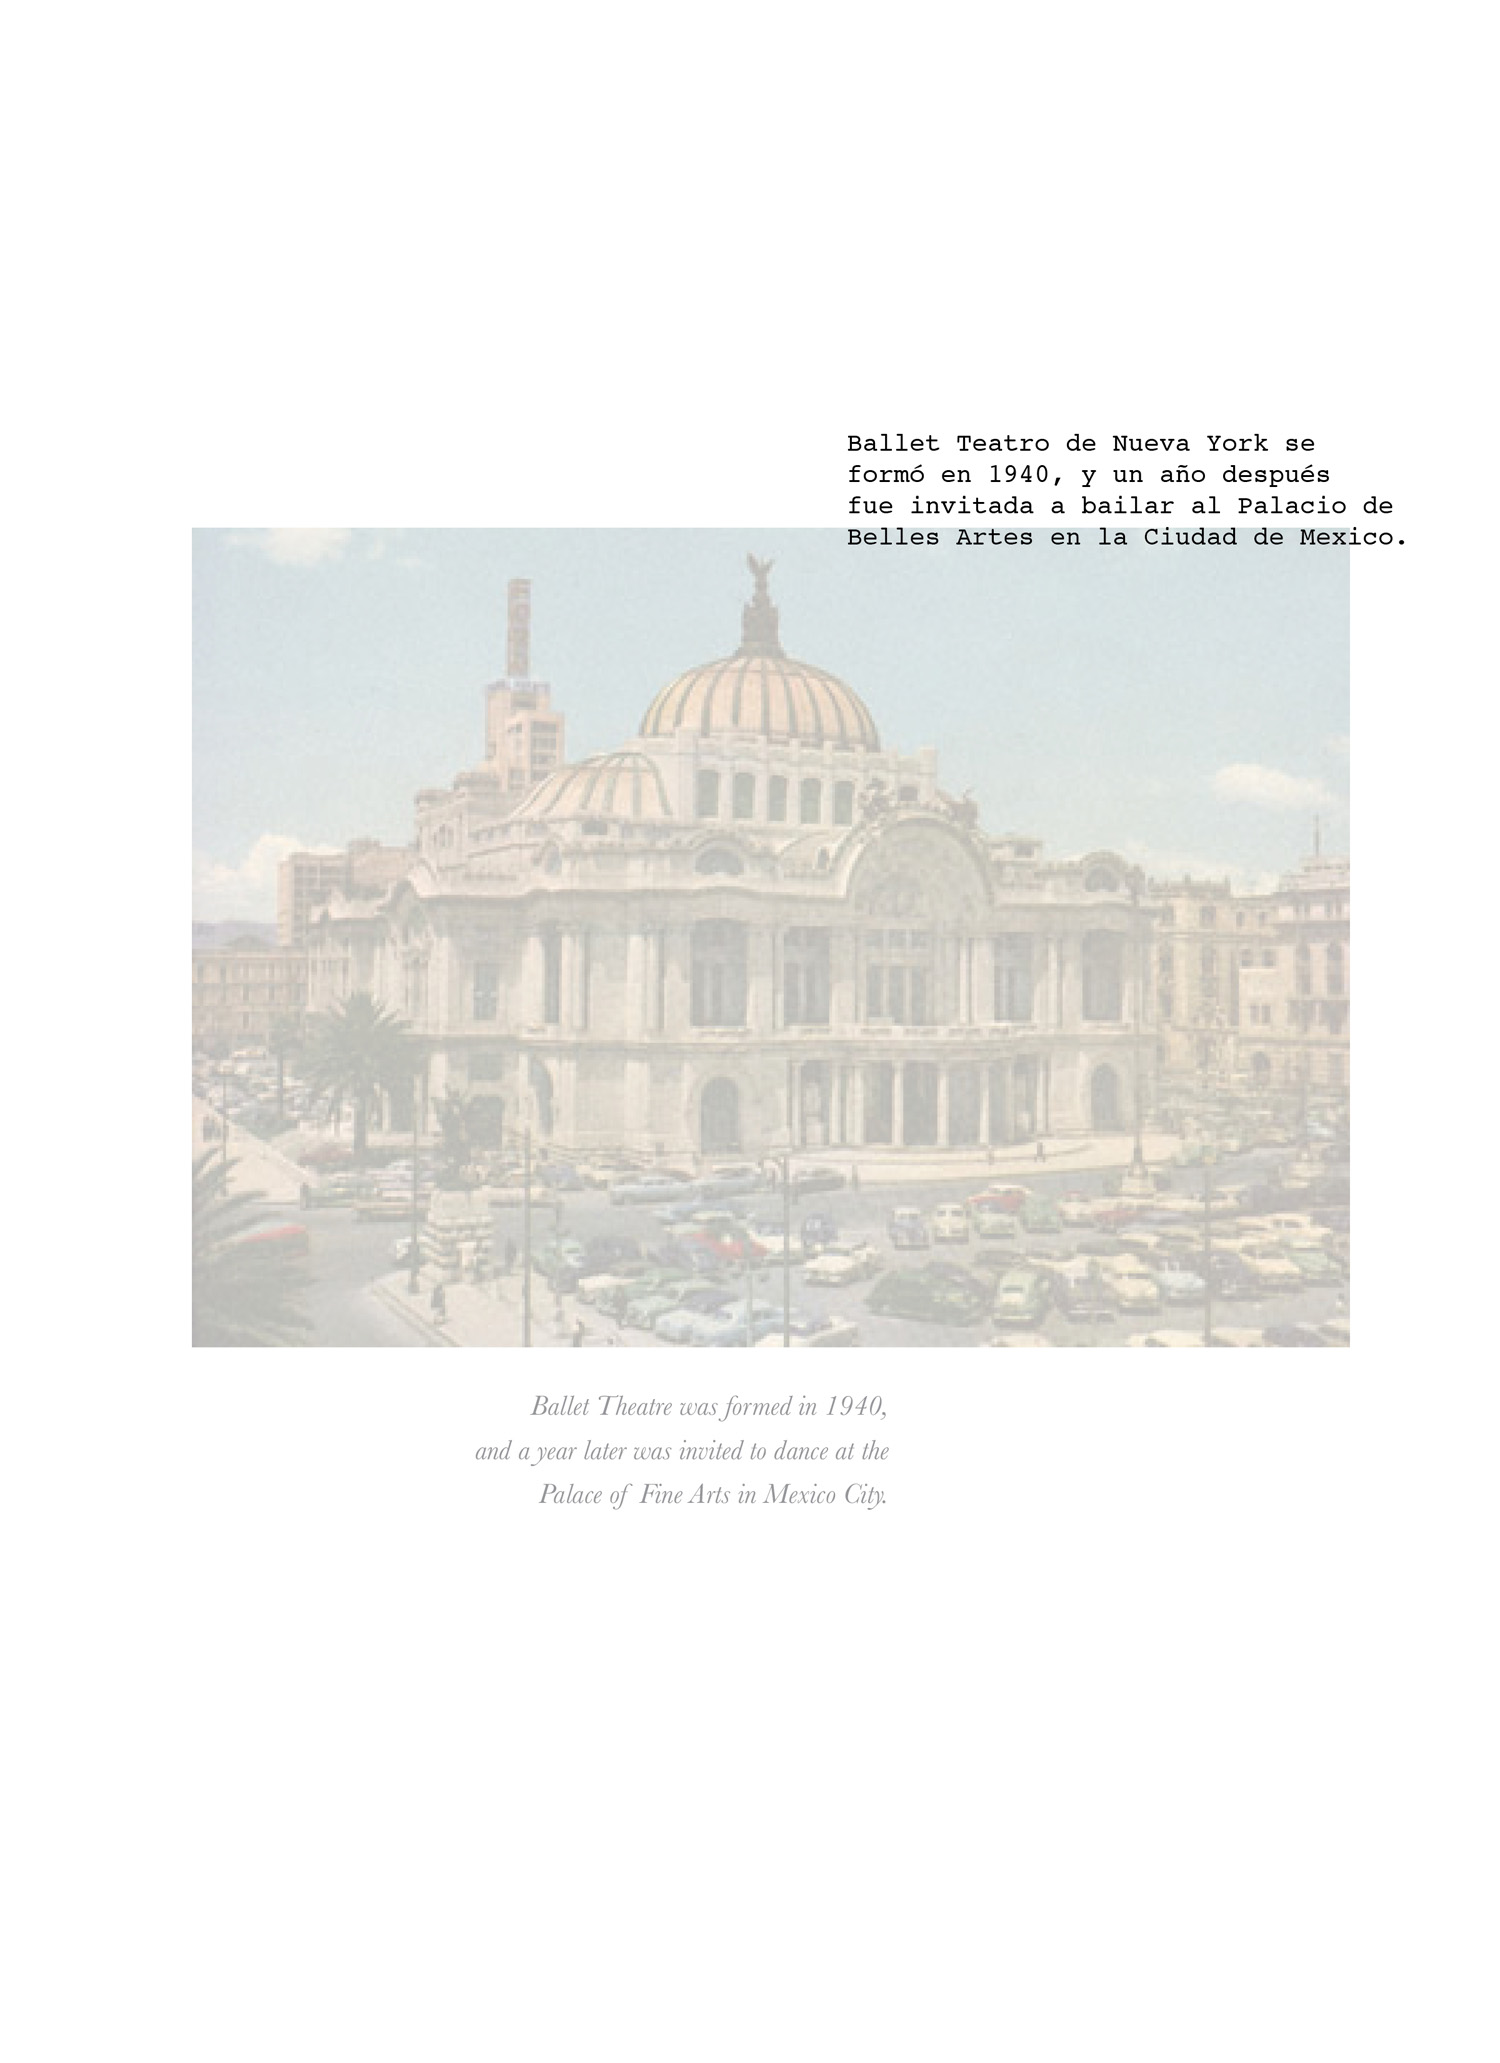 mexico book composite6.jpg